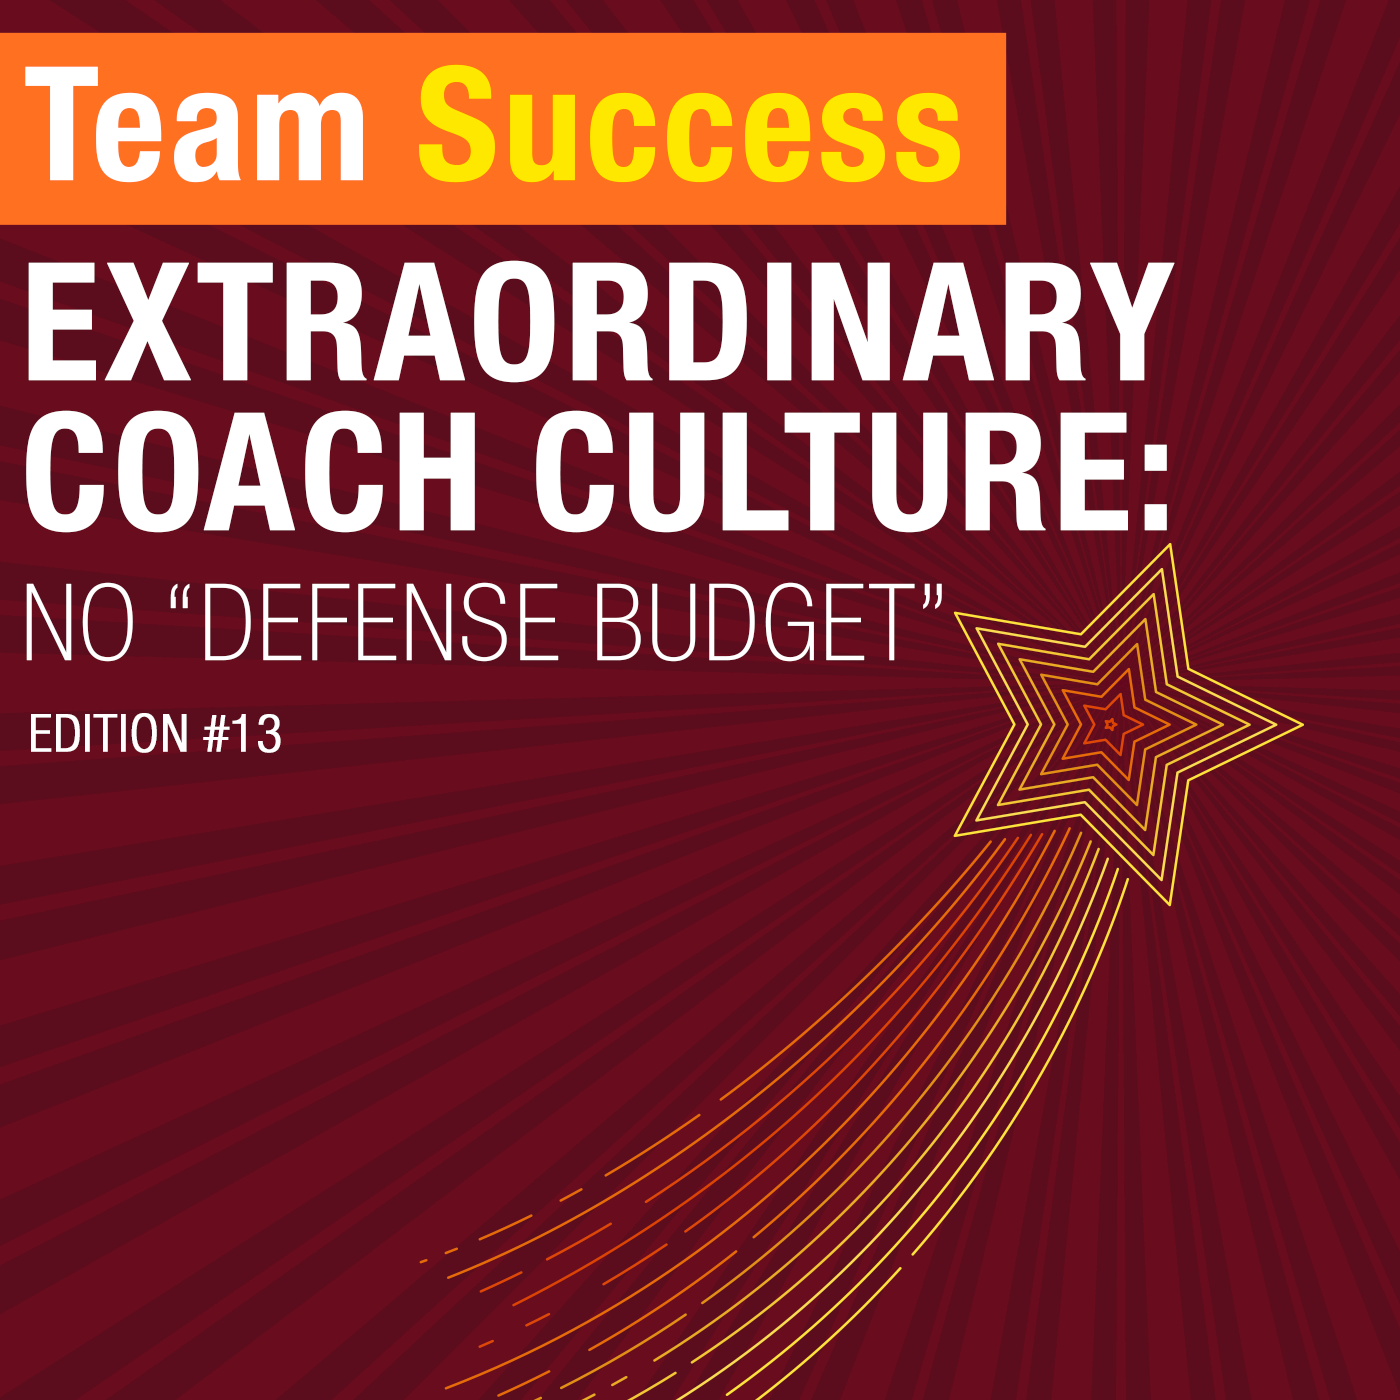 Extraordinary Coach Culture: No